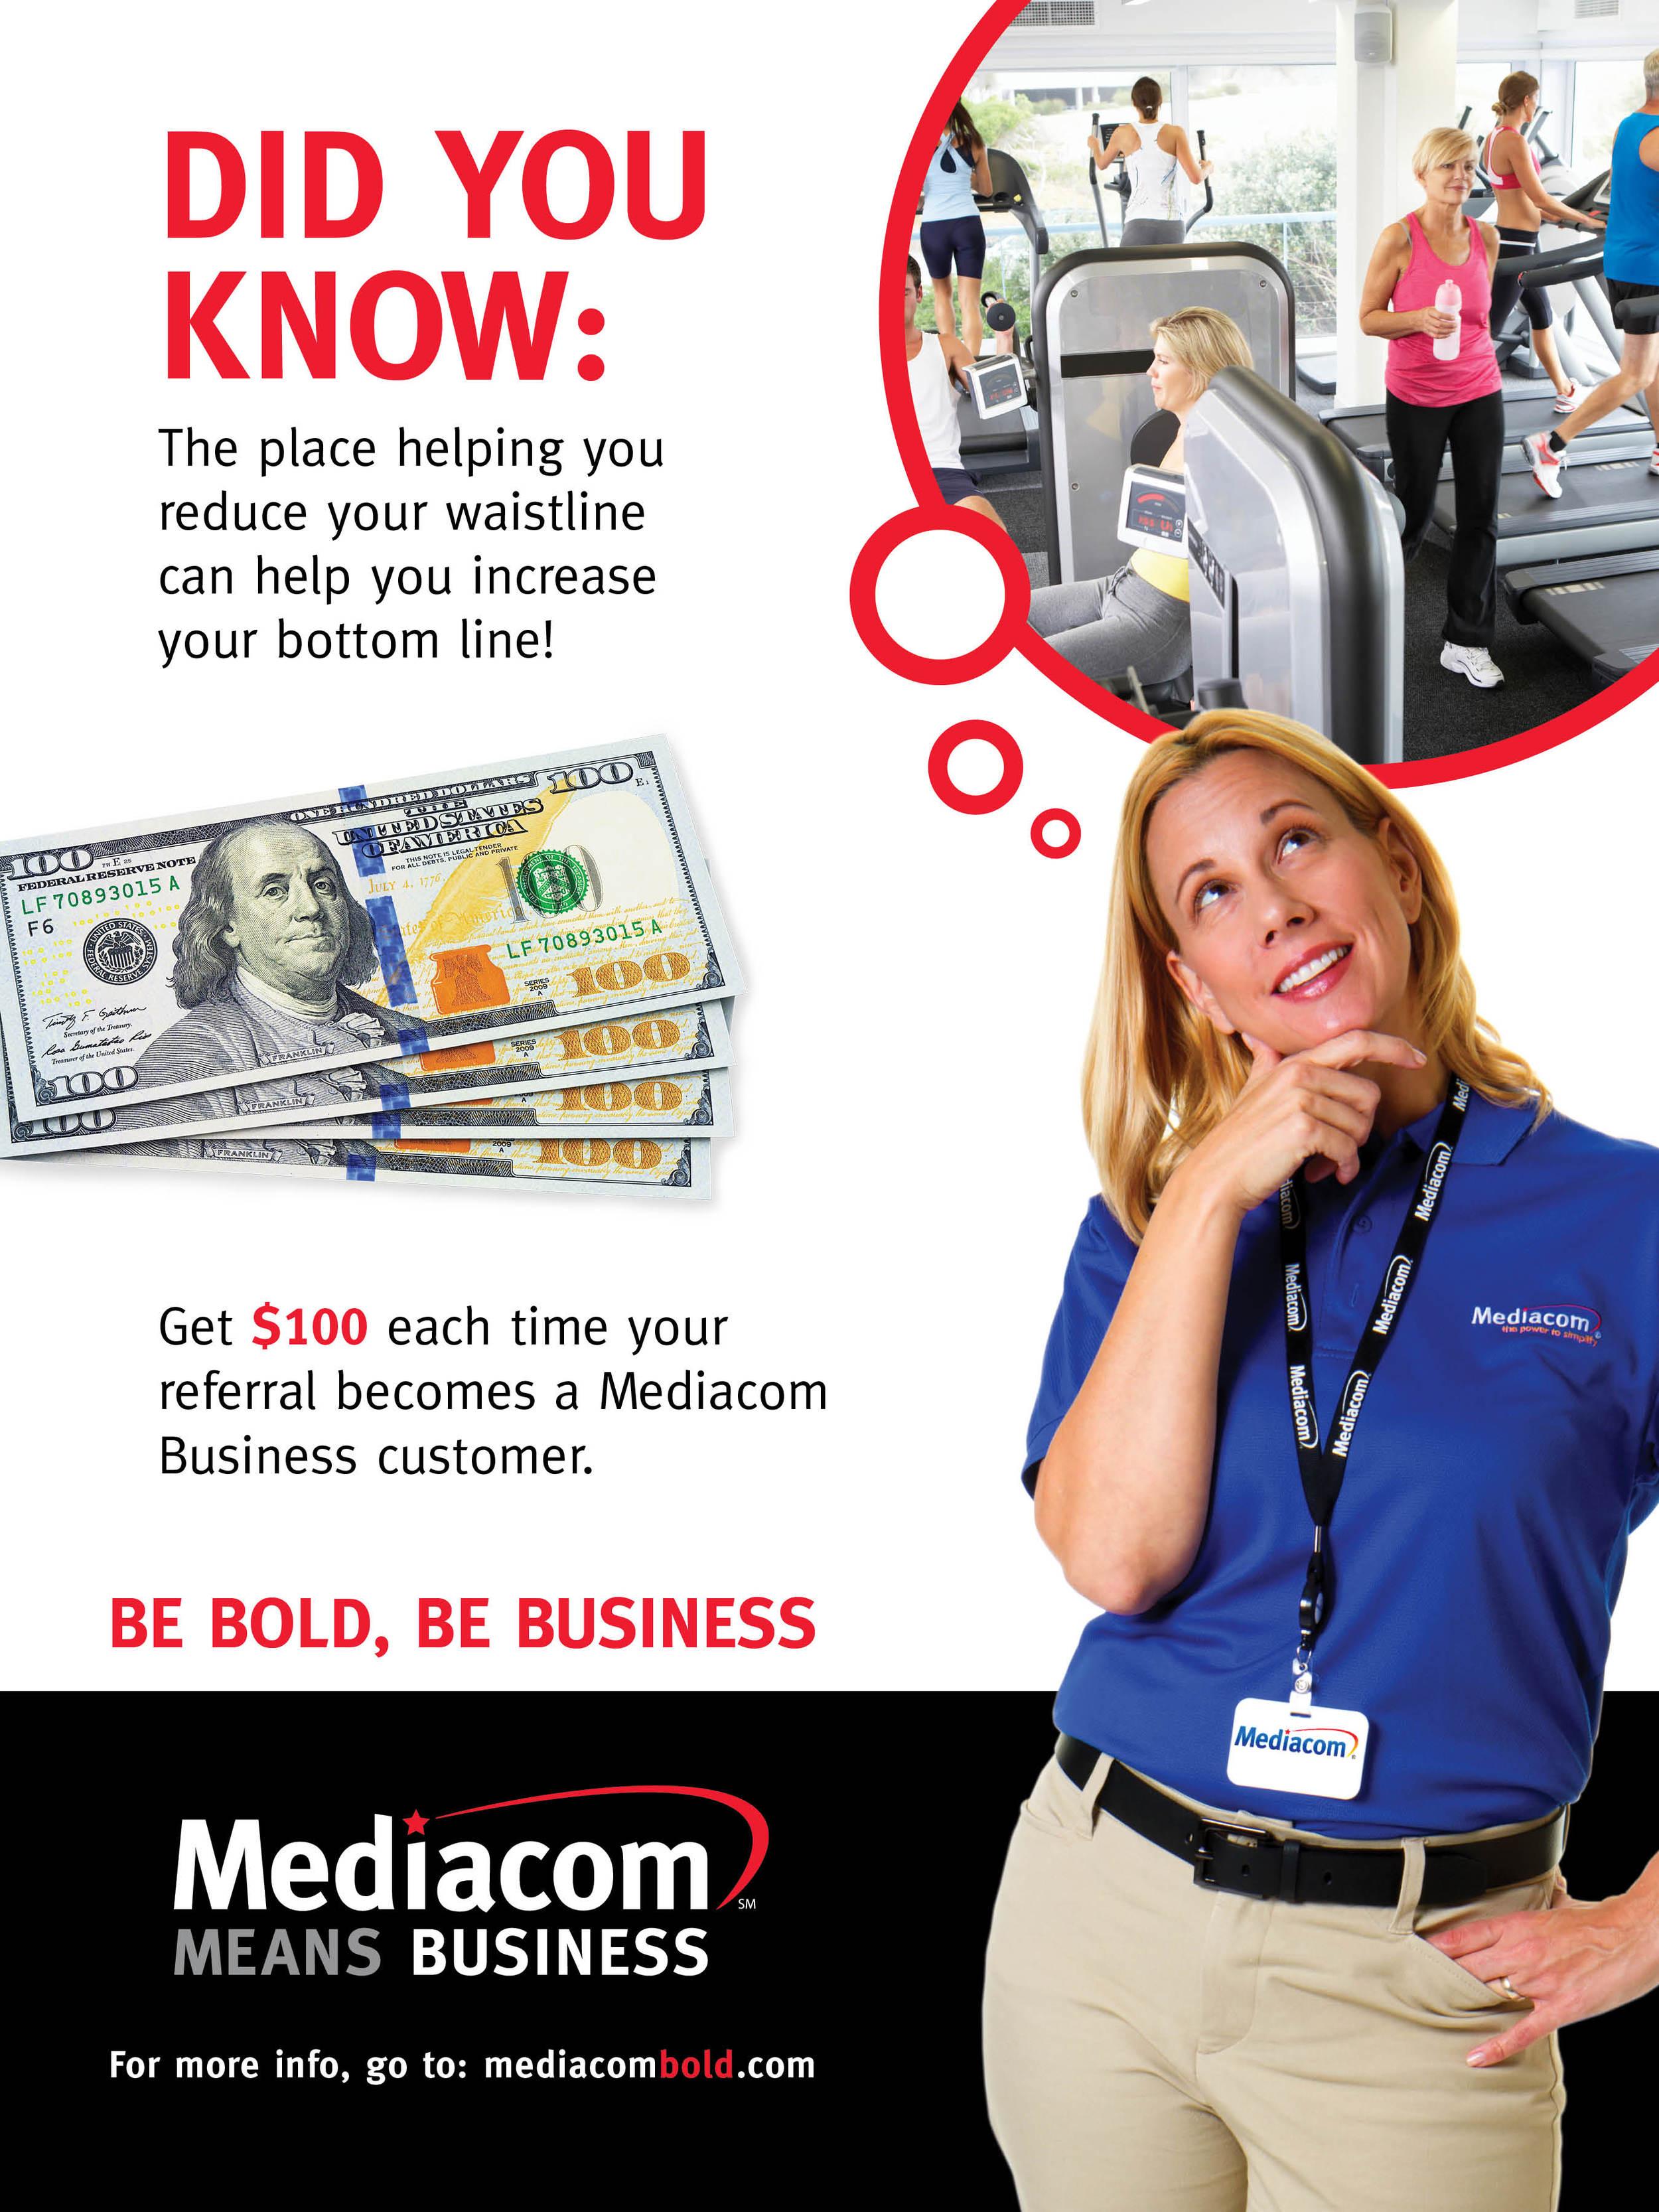 Mediacom_ReferaBiz2014_posters_13.jpg